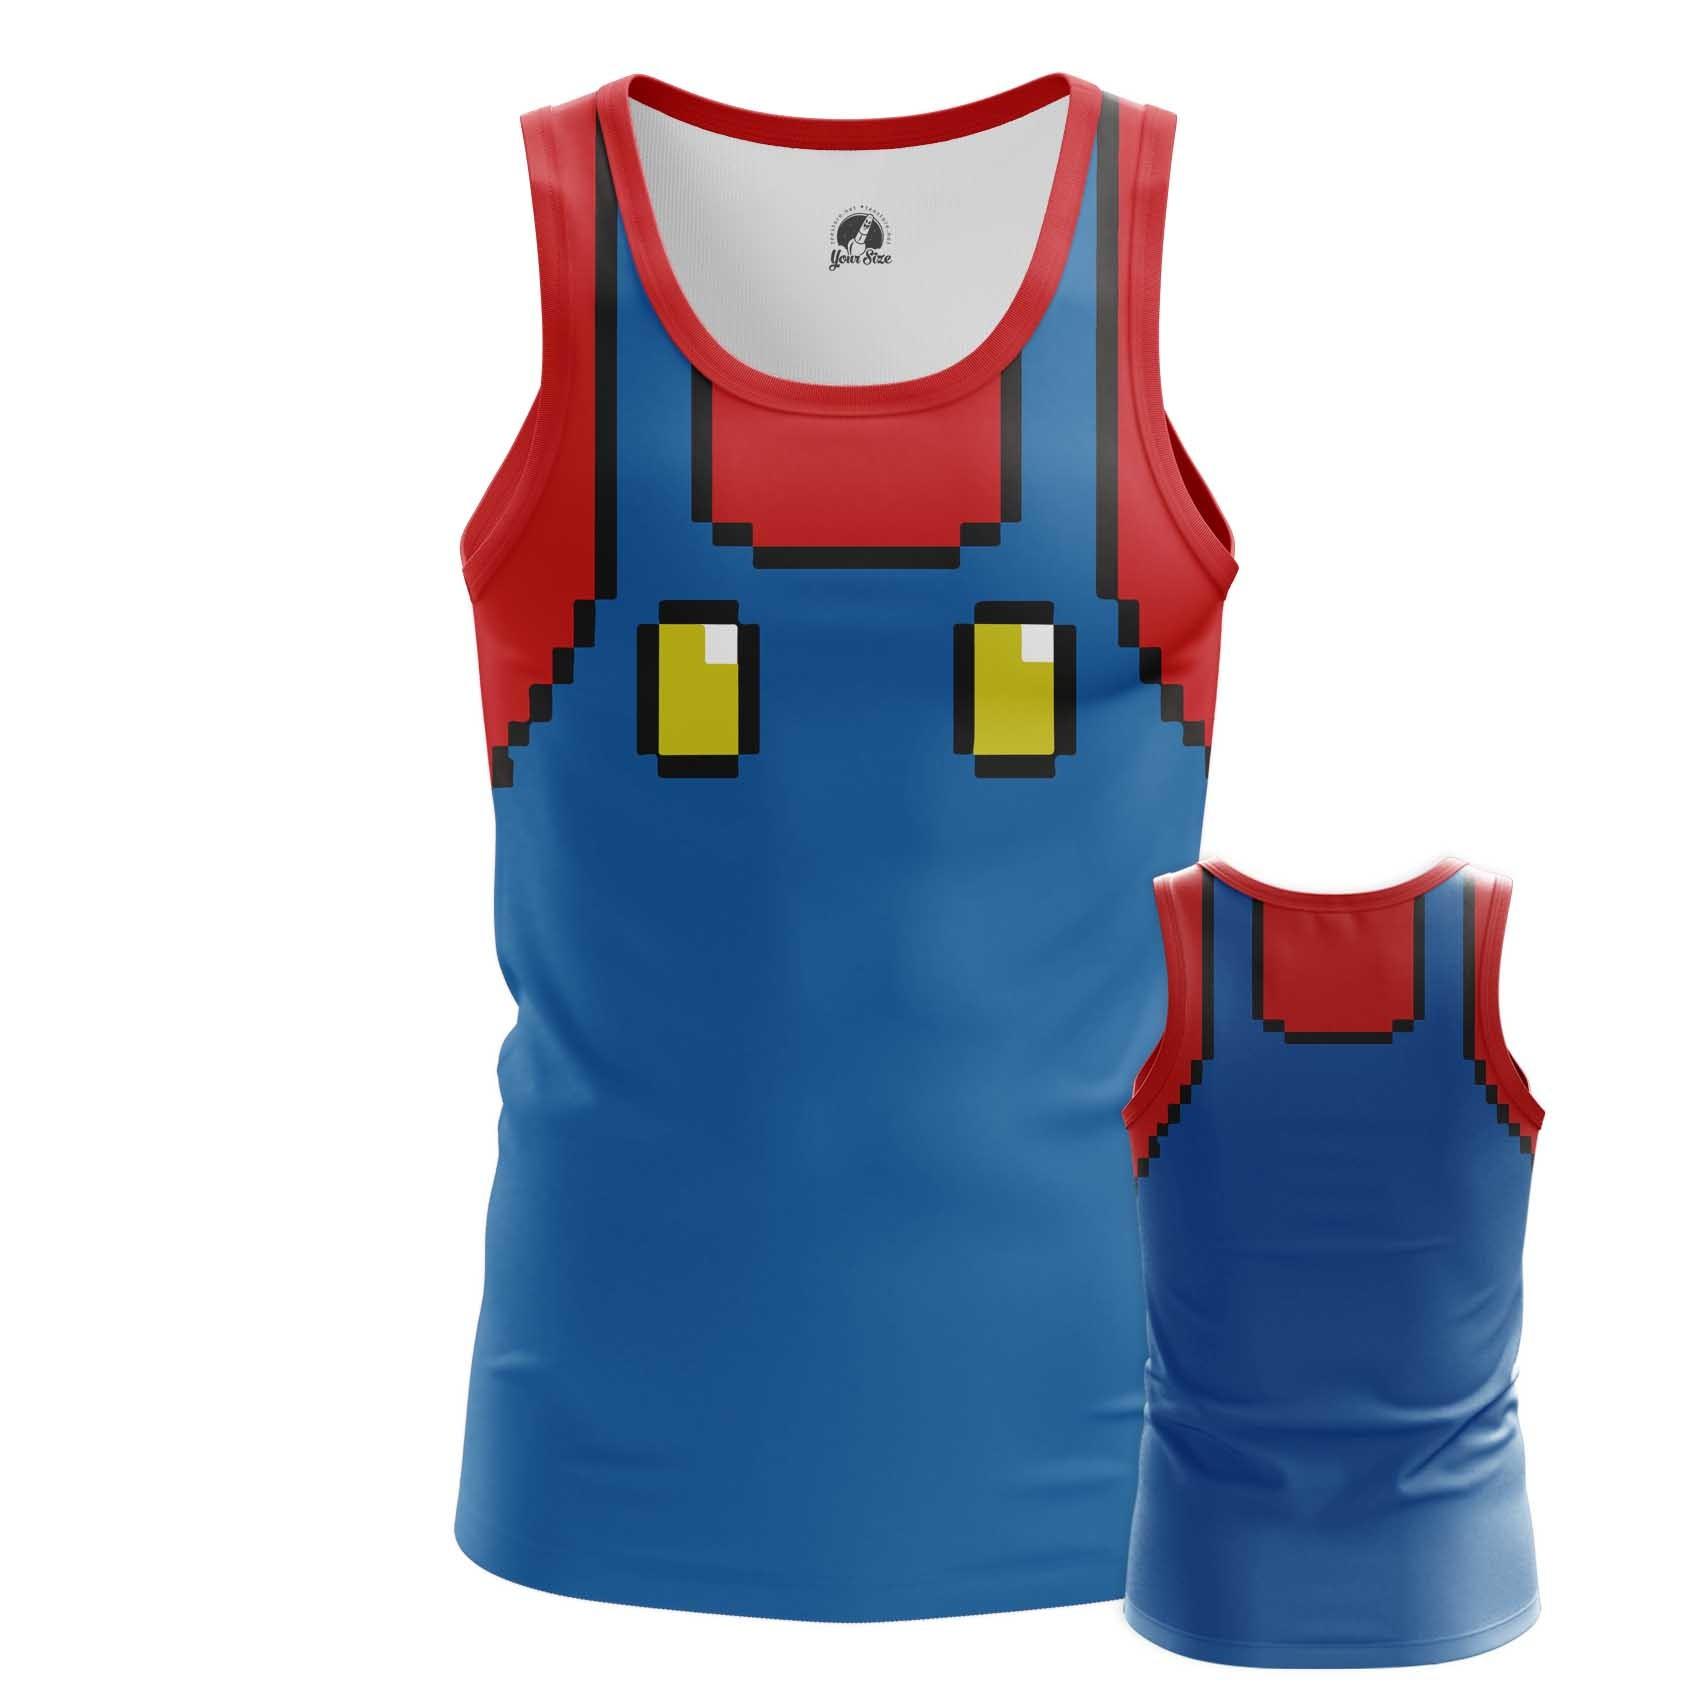 Collectibles Men'S T-Shirt Mario Costume Suit Nintendo Art